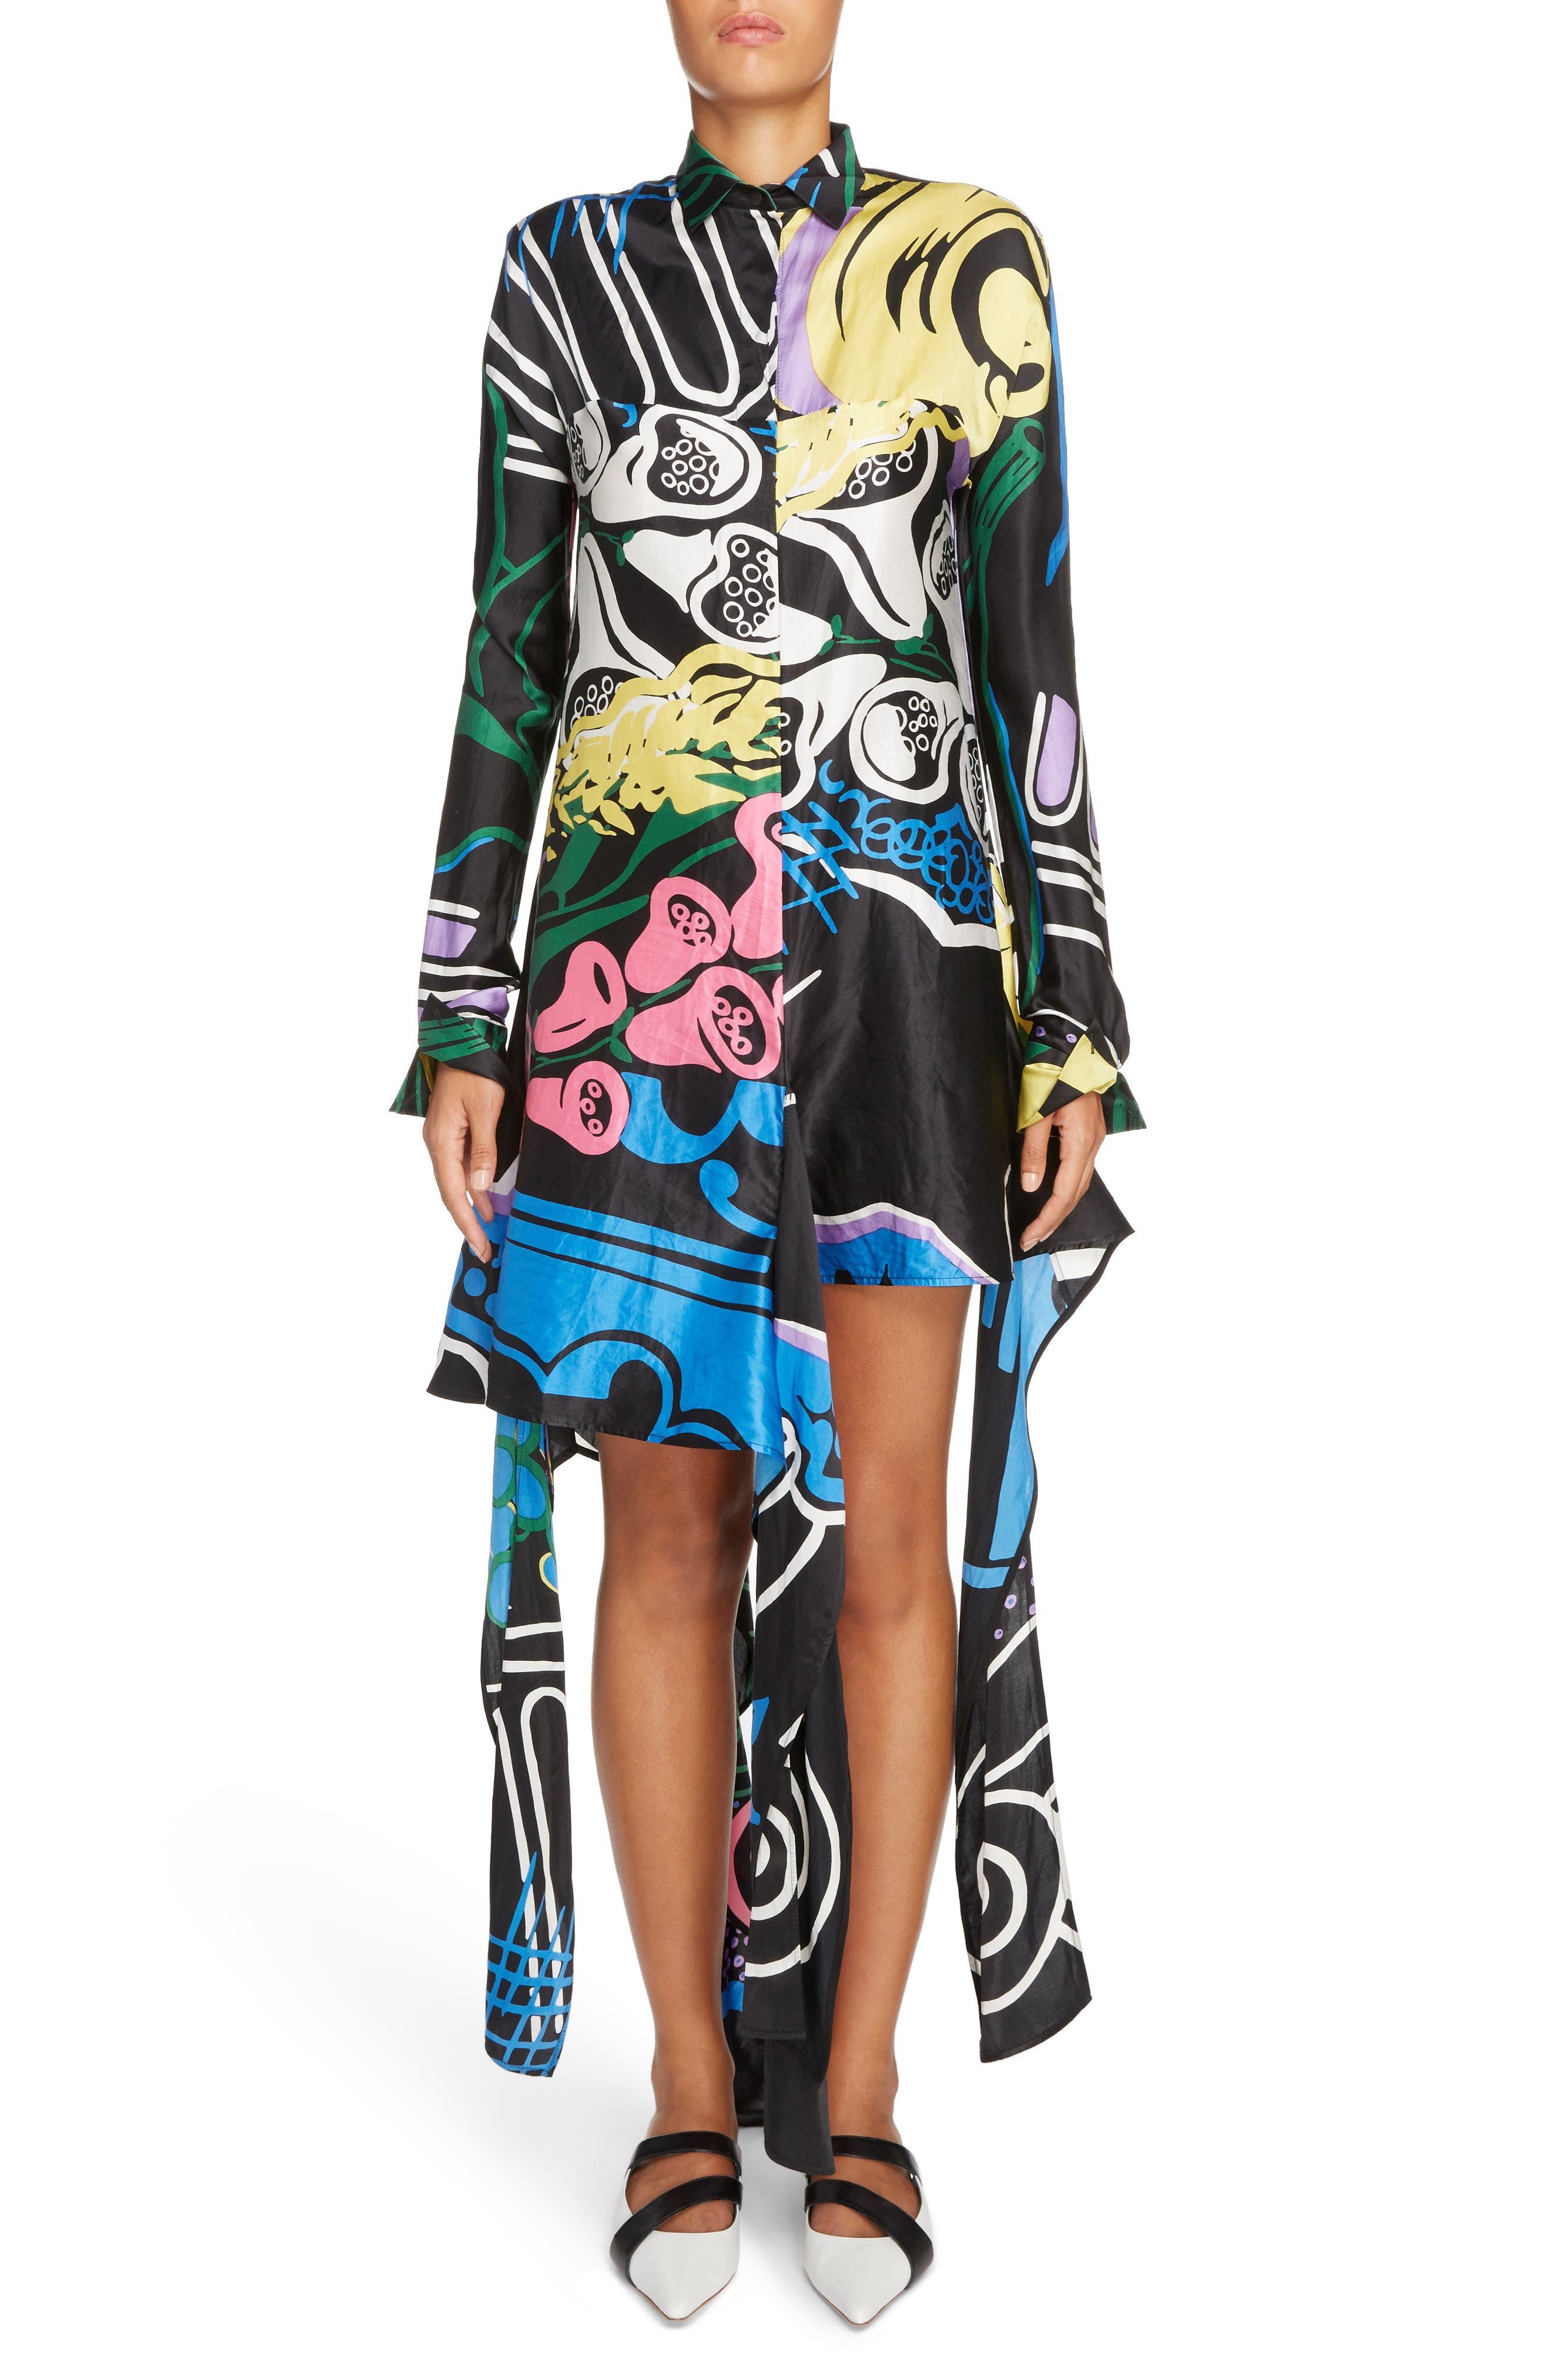 Main Image - J.W.ANDERSON Foxglove Print Dress with Ribbon Detail